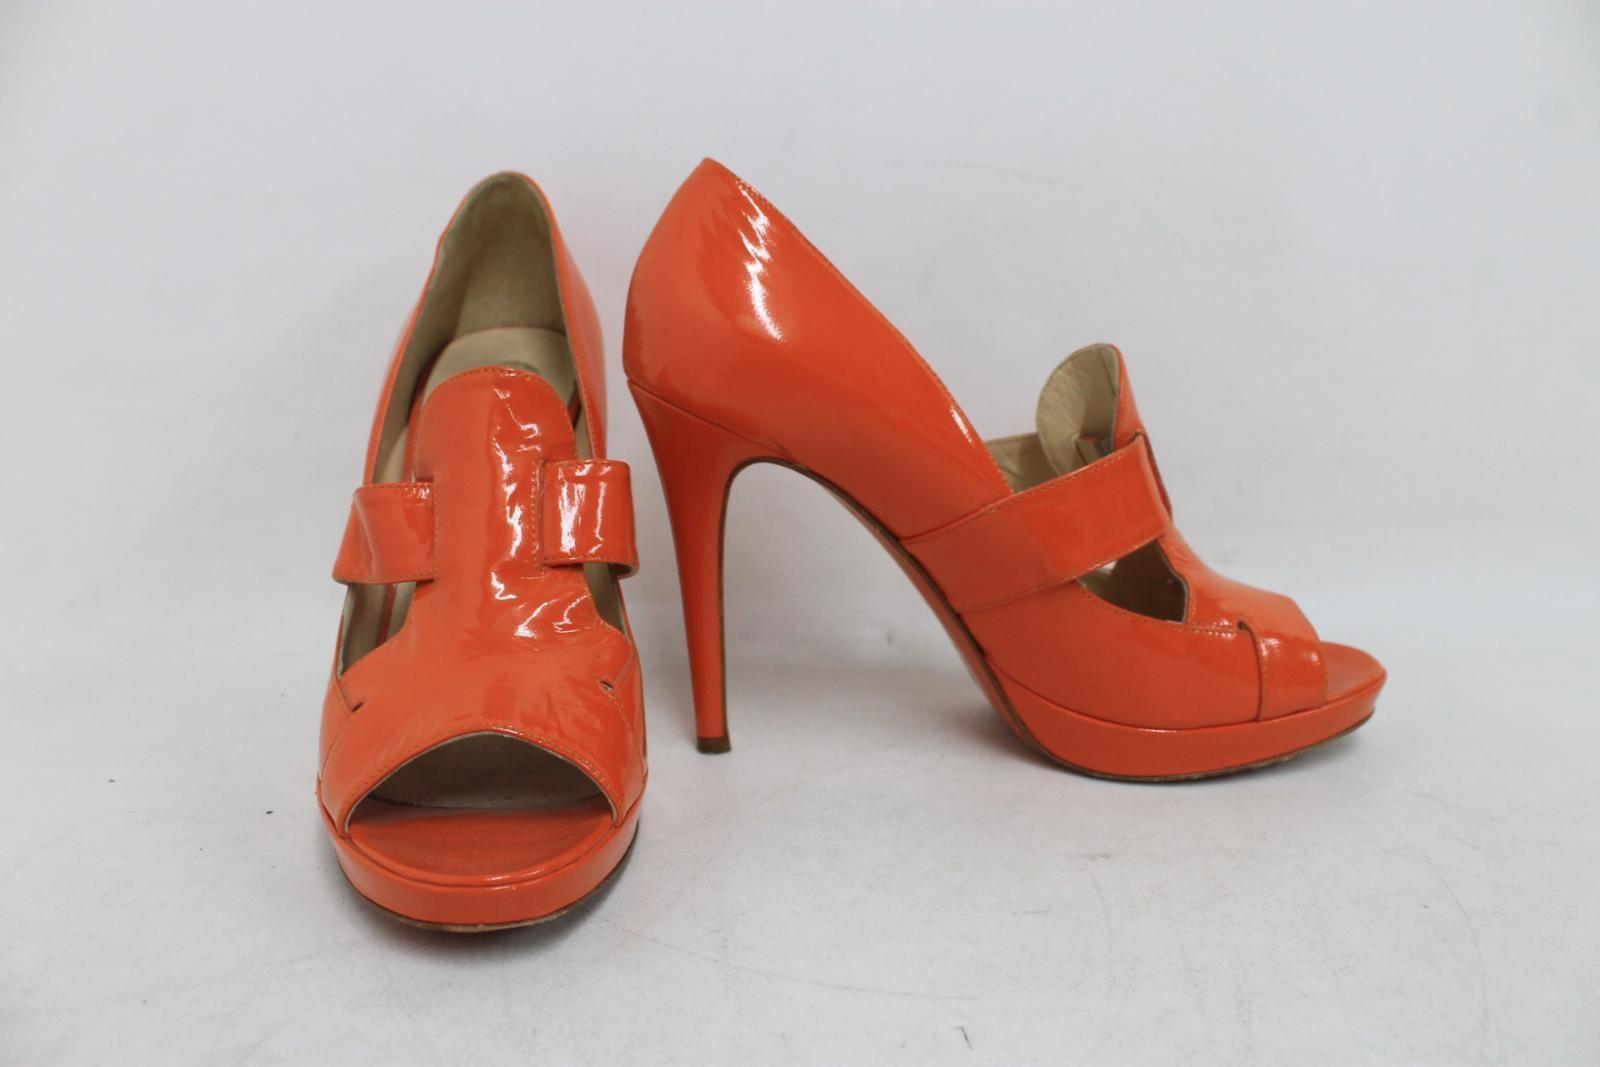 VERSACE-Ladies-Orange-Patent-Leather-Peep-Toe-High-Heel-Mules-Shoes-UK6-EU39